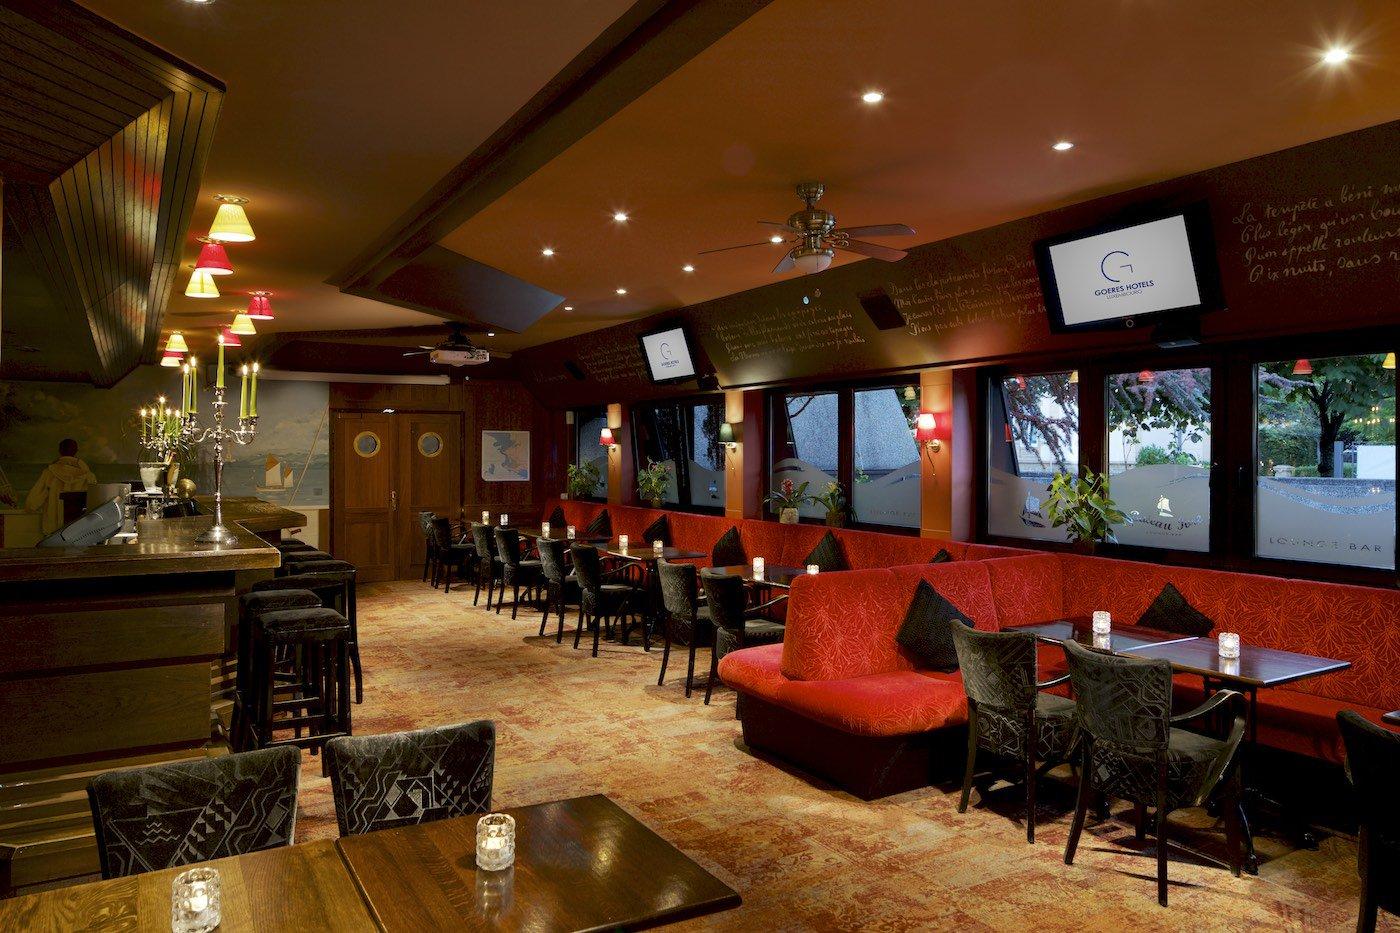 Goeres Hotels - Bar Le Bateau Ivre